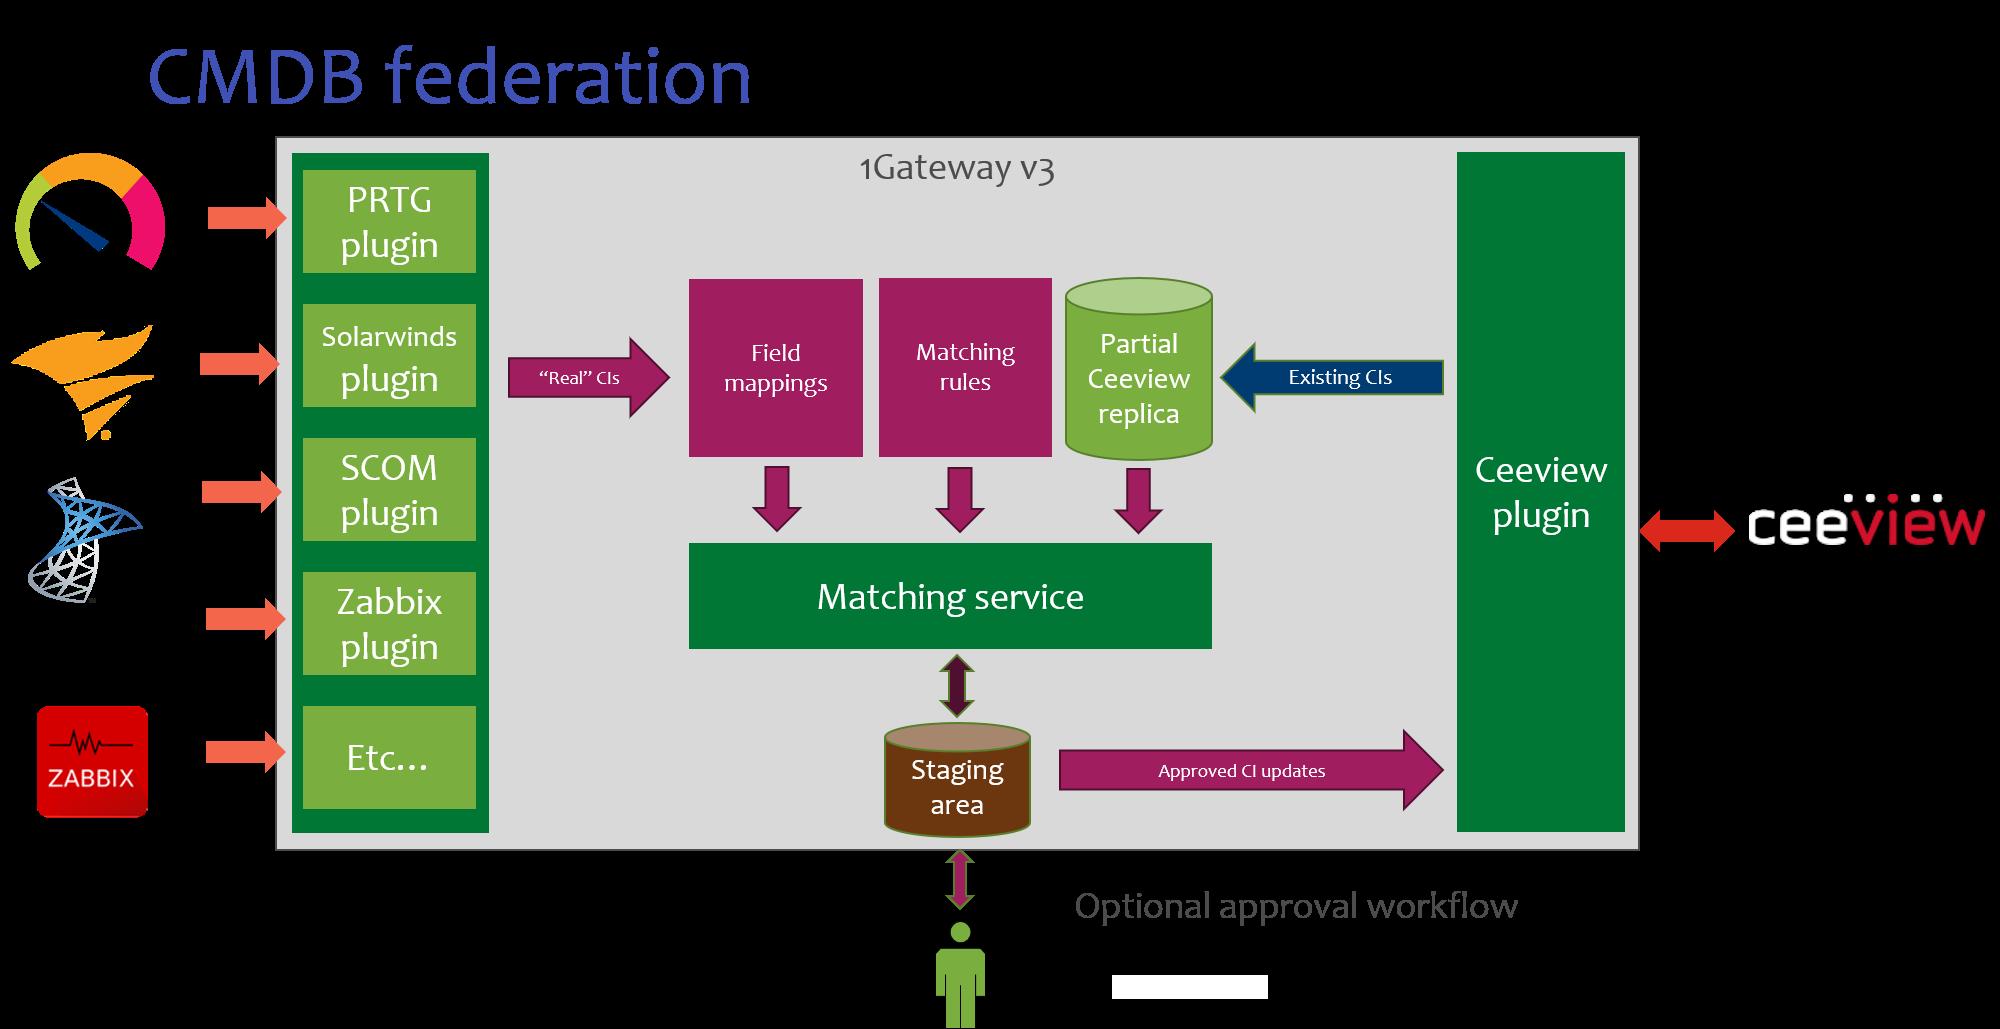 architecture showing 1gateways cmd federation approach